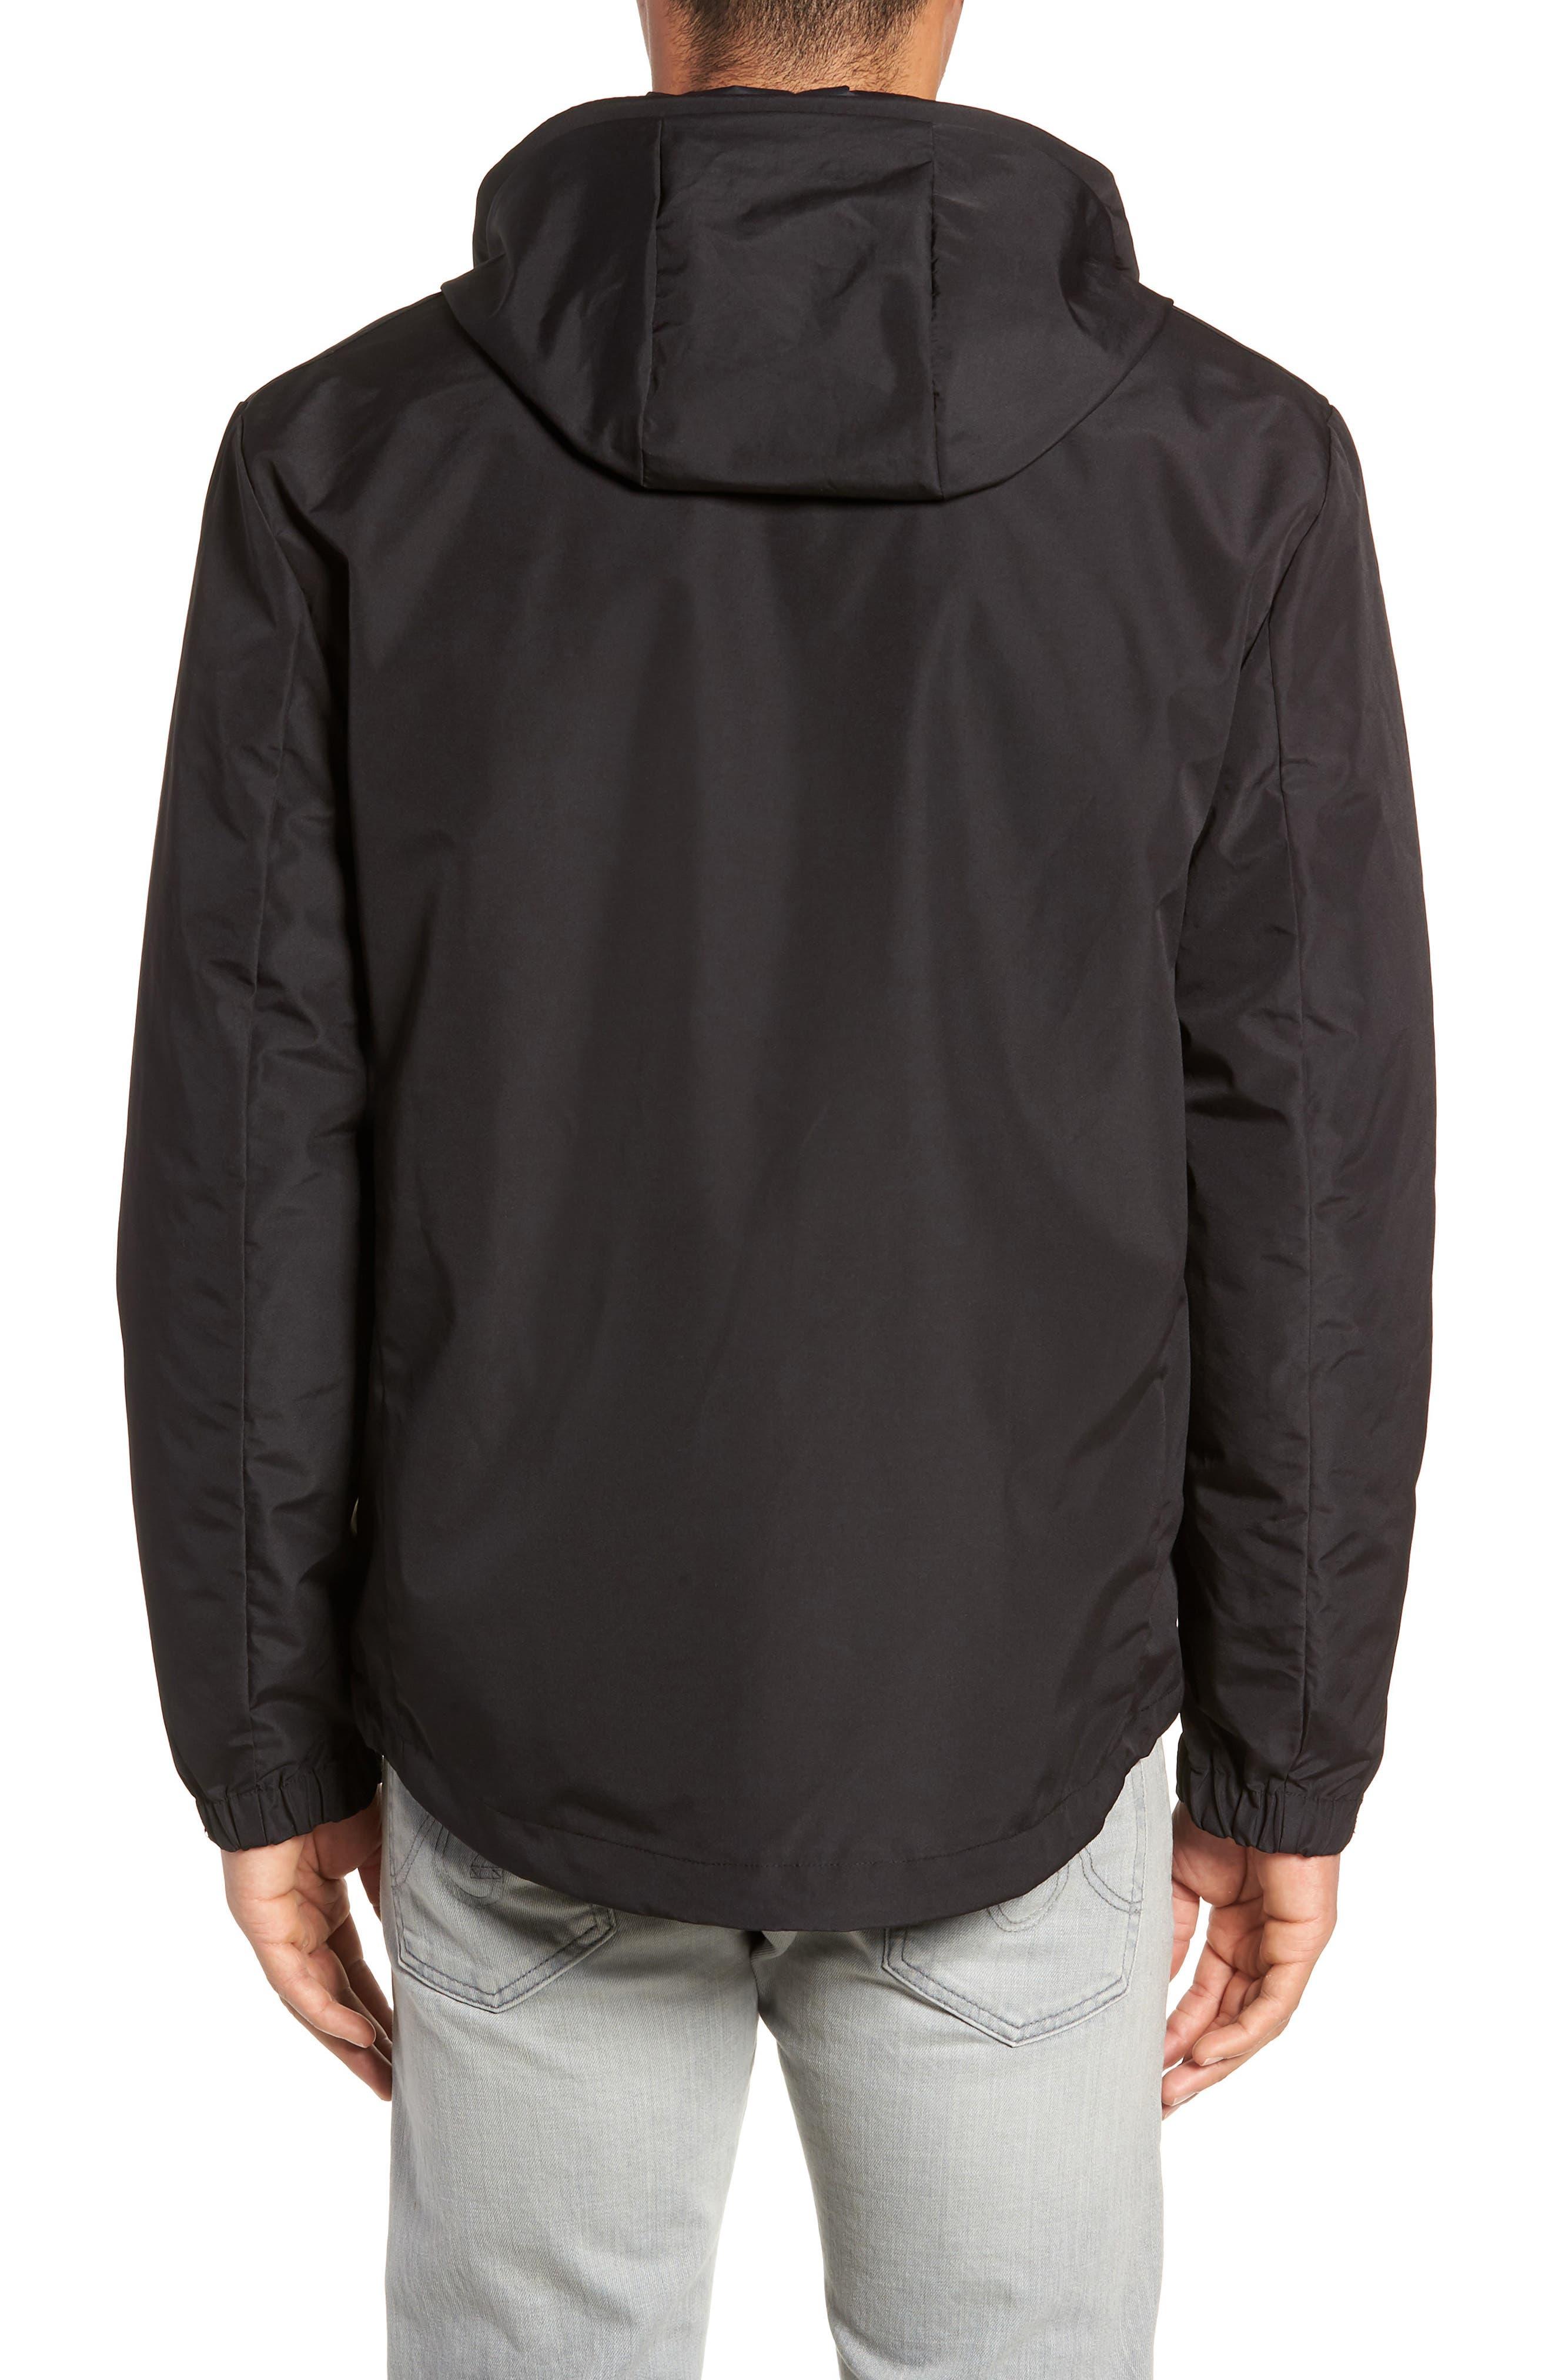 3-in-1 Rain Jacket,                             Alternate thumbnail 3, color,                             BLACK